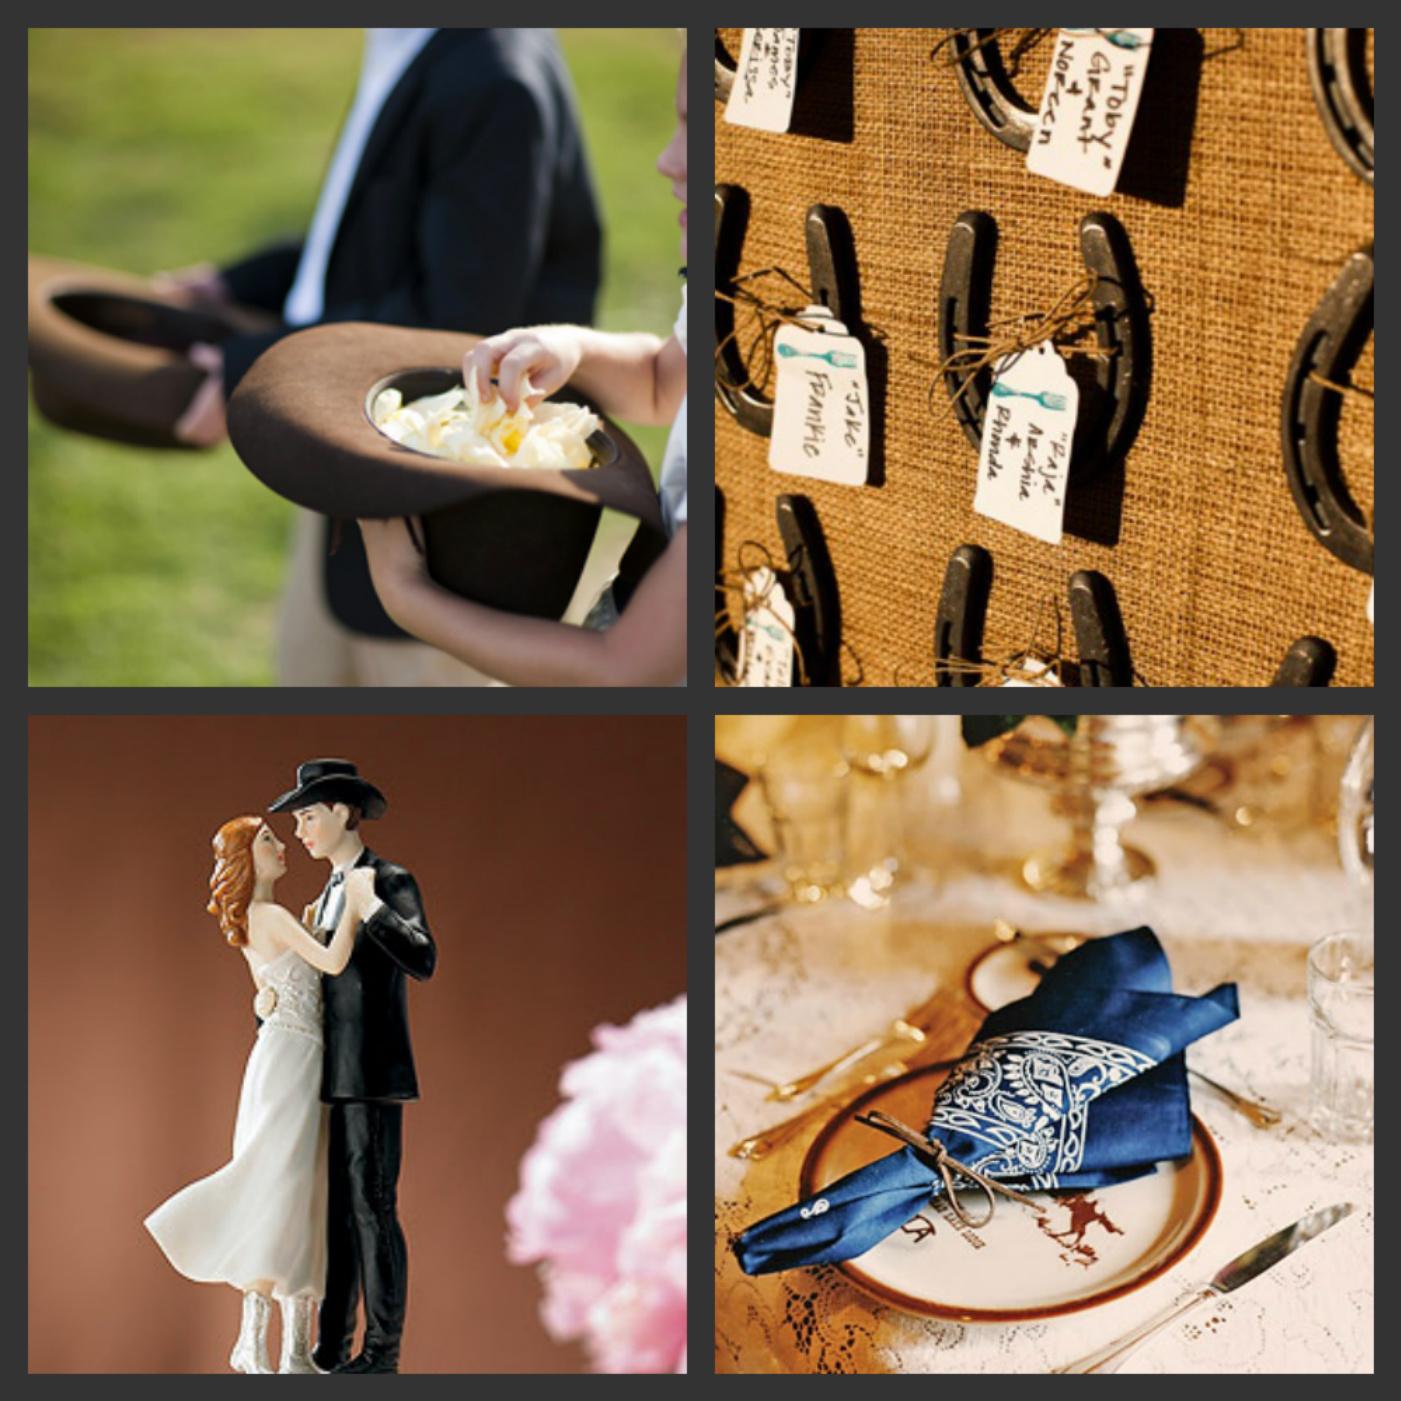 Weddings Are Fun Blog Western Themed Wedding for Cowgirl